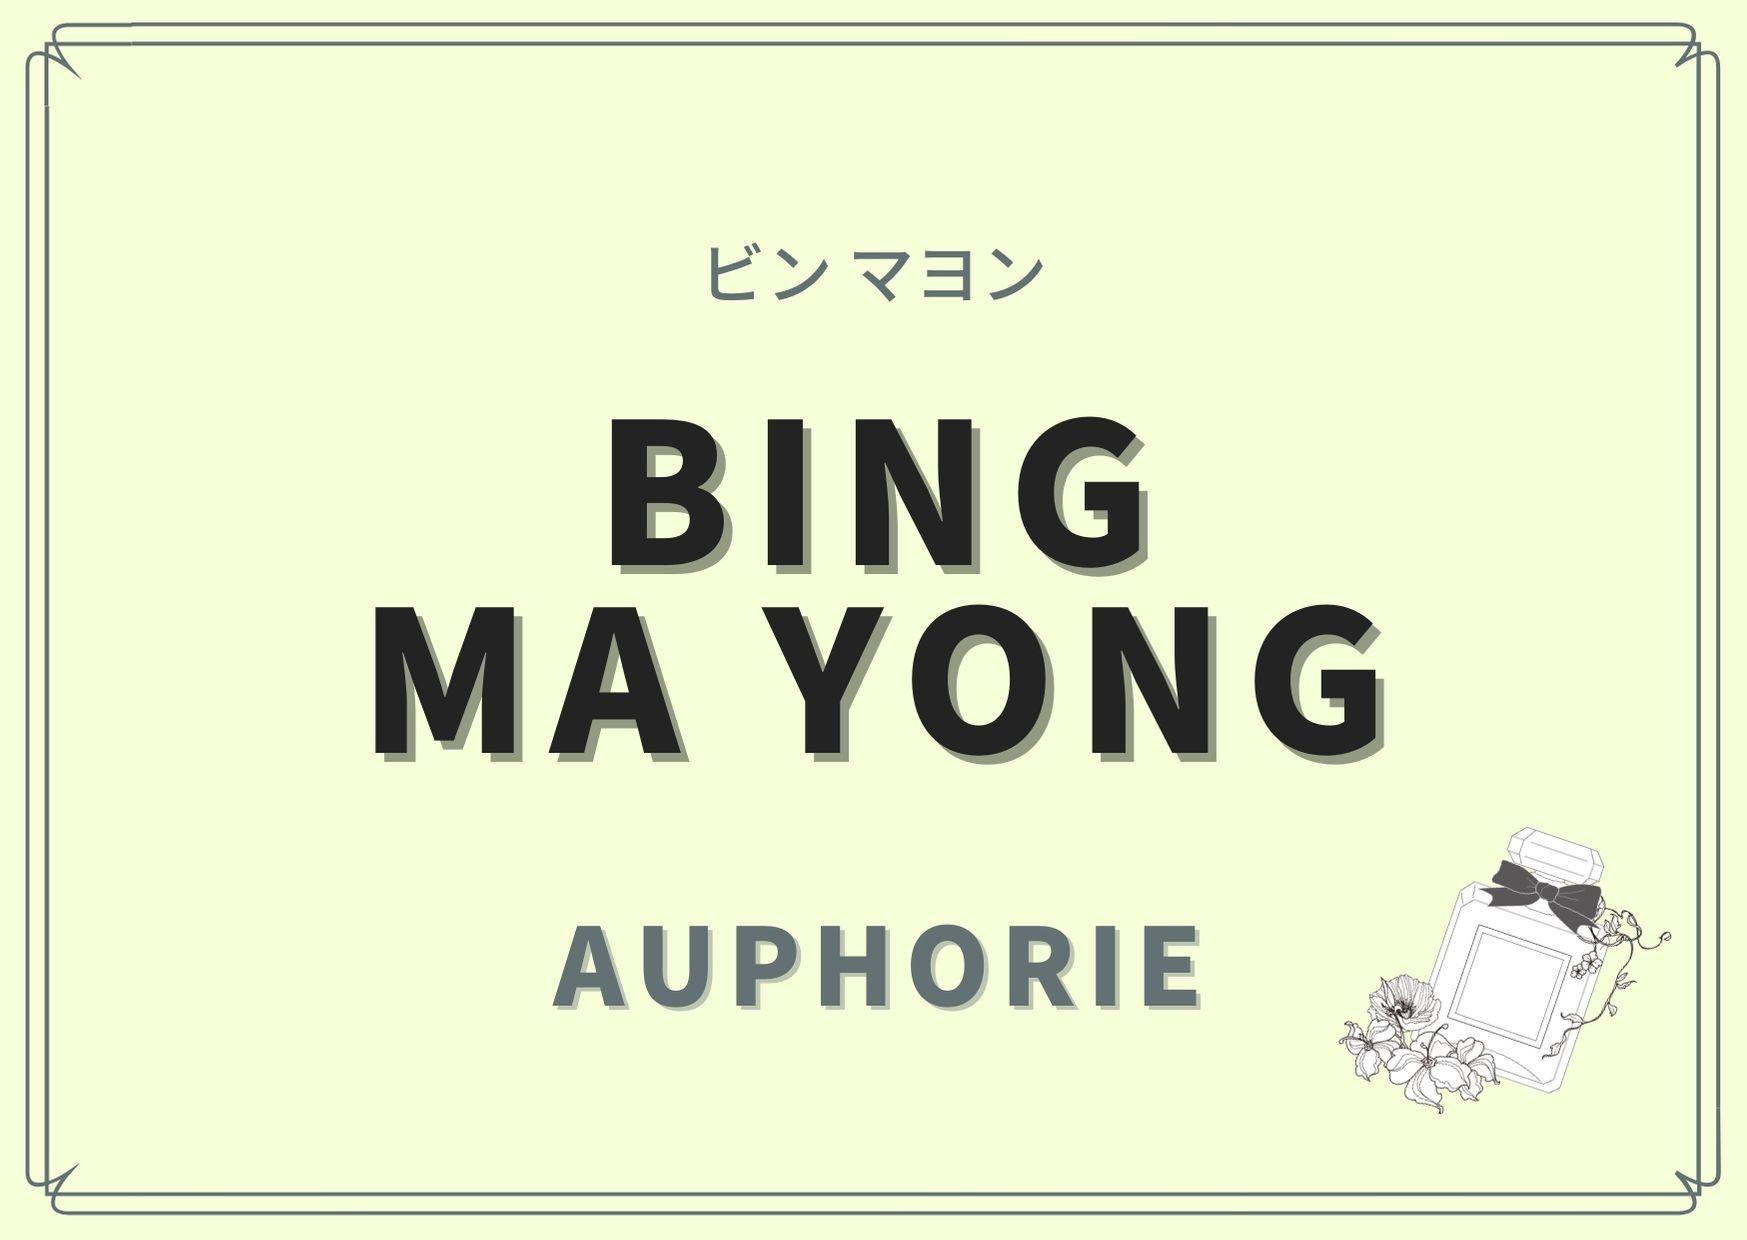 BING MA YONG(ビン マヨン)/AUPHORIE(オーフォリー)